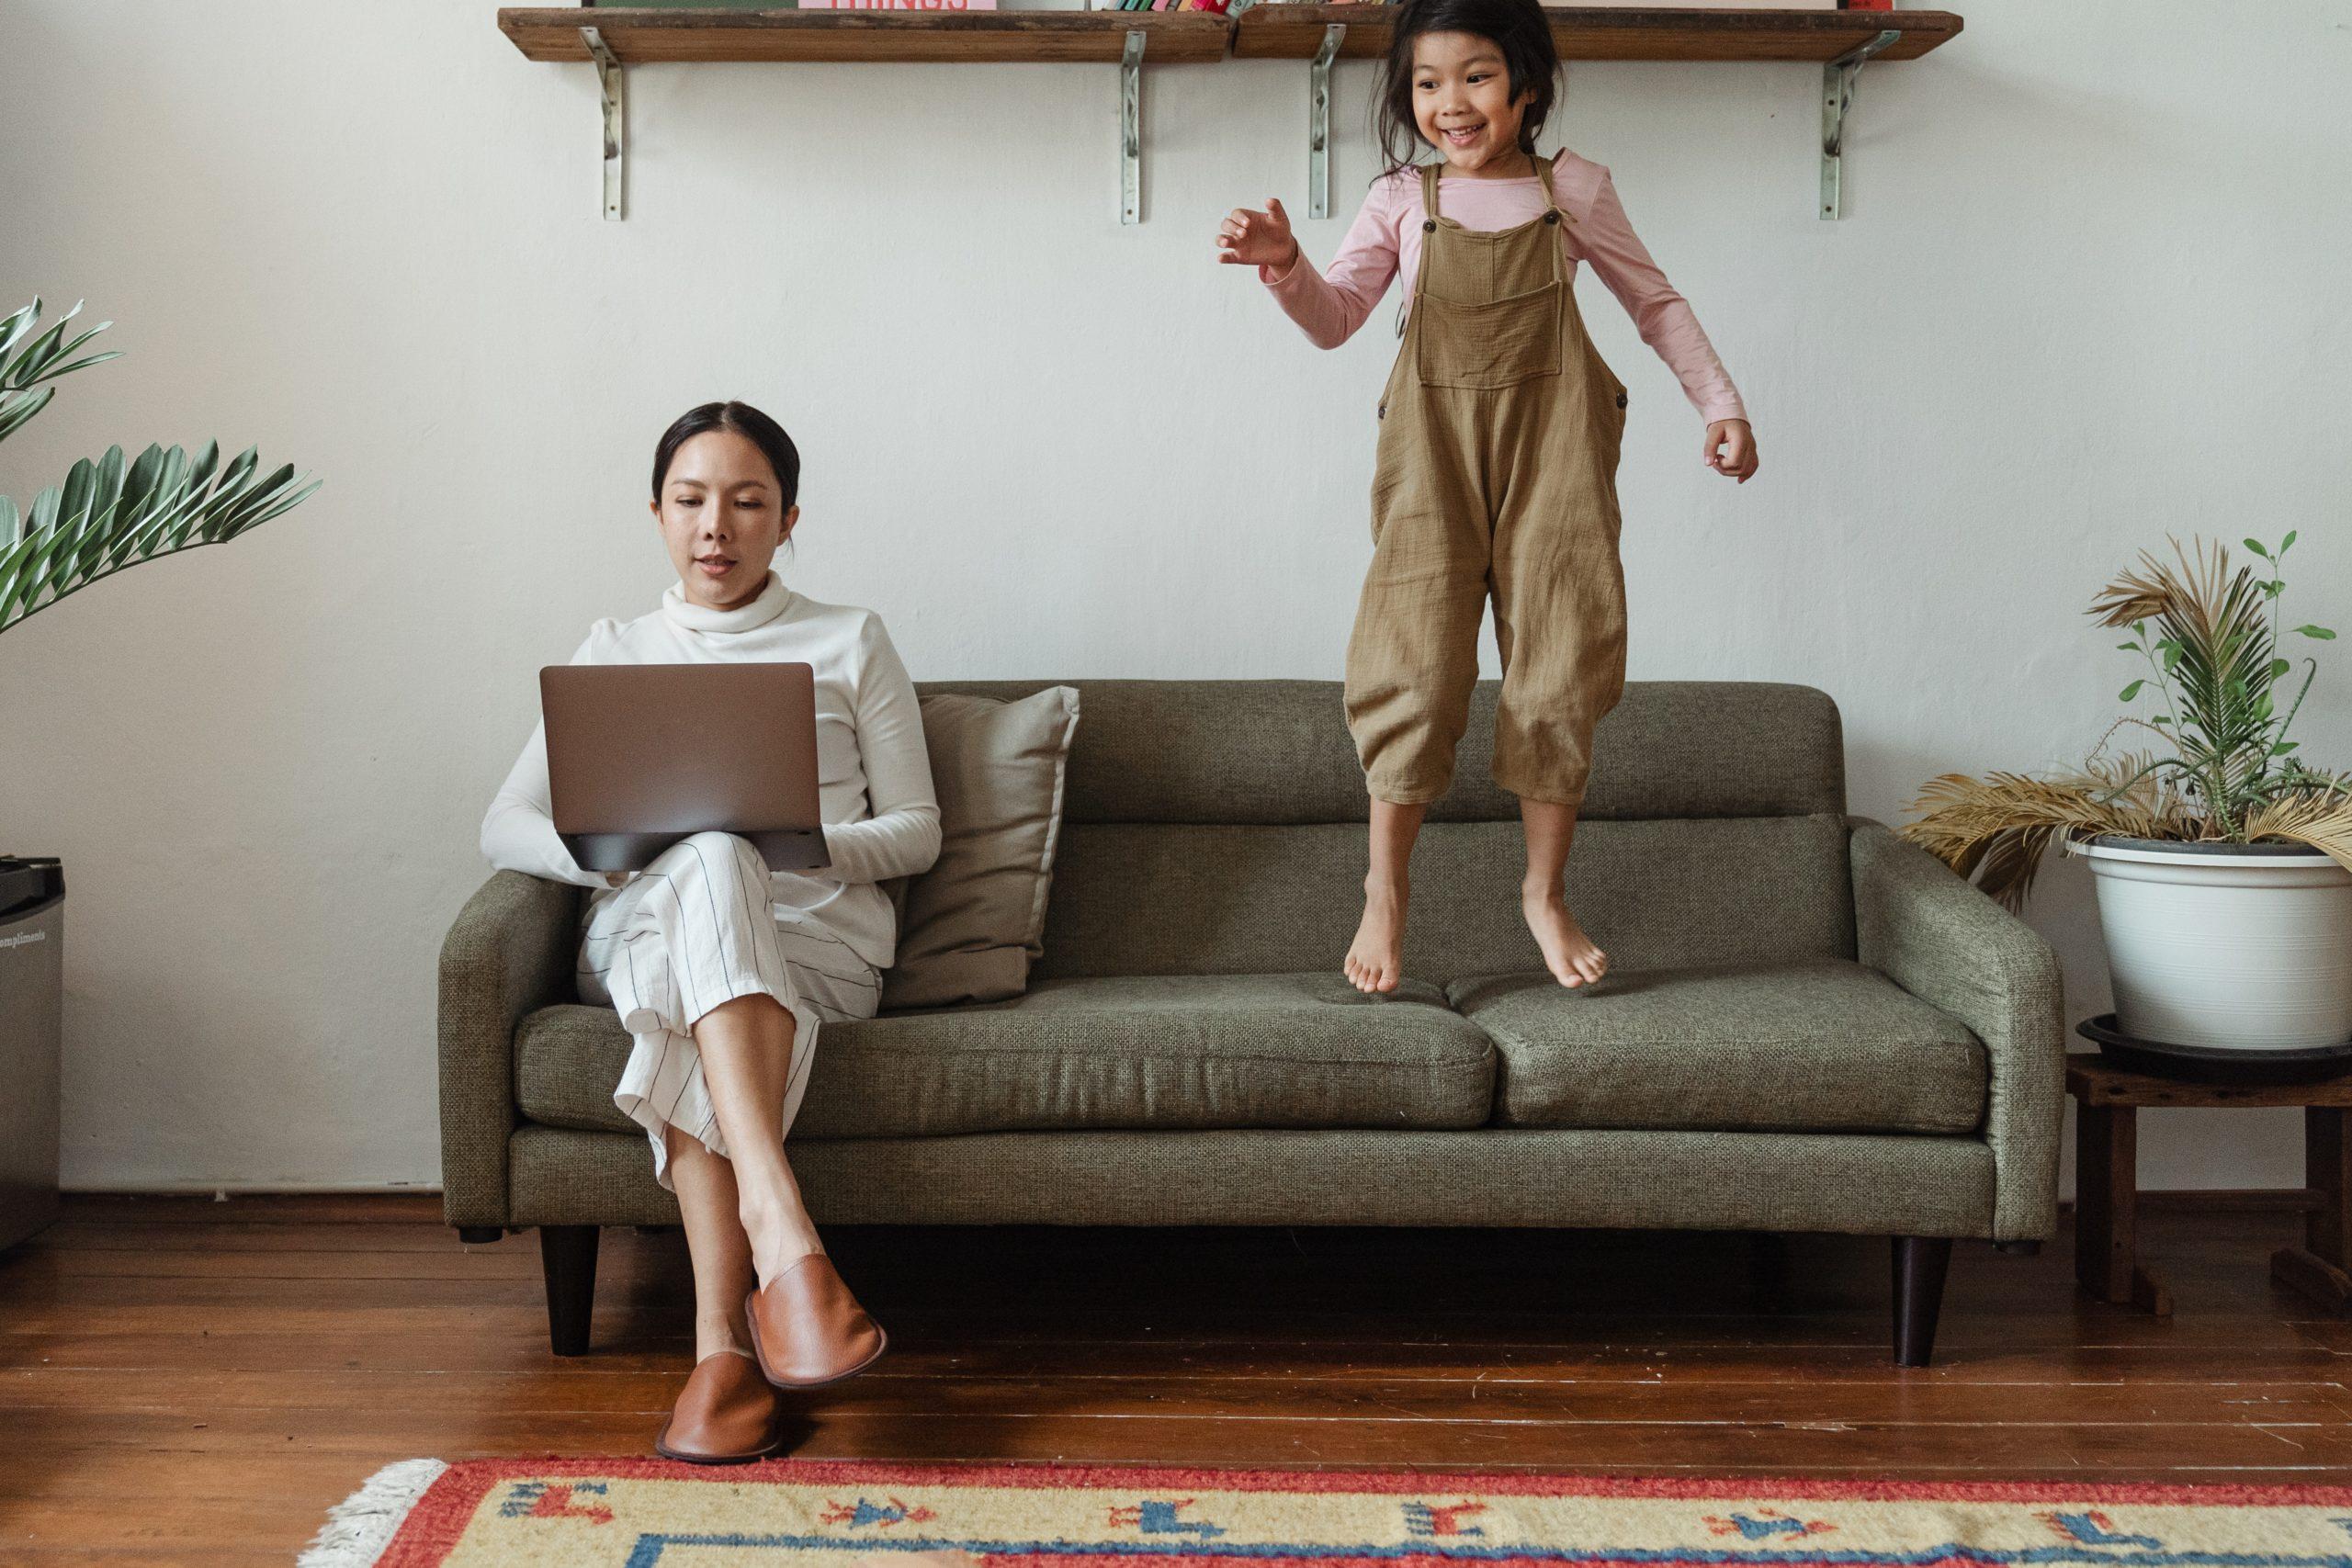 reconversion professionnelle reorientation temoignage maman